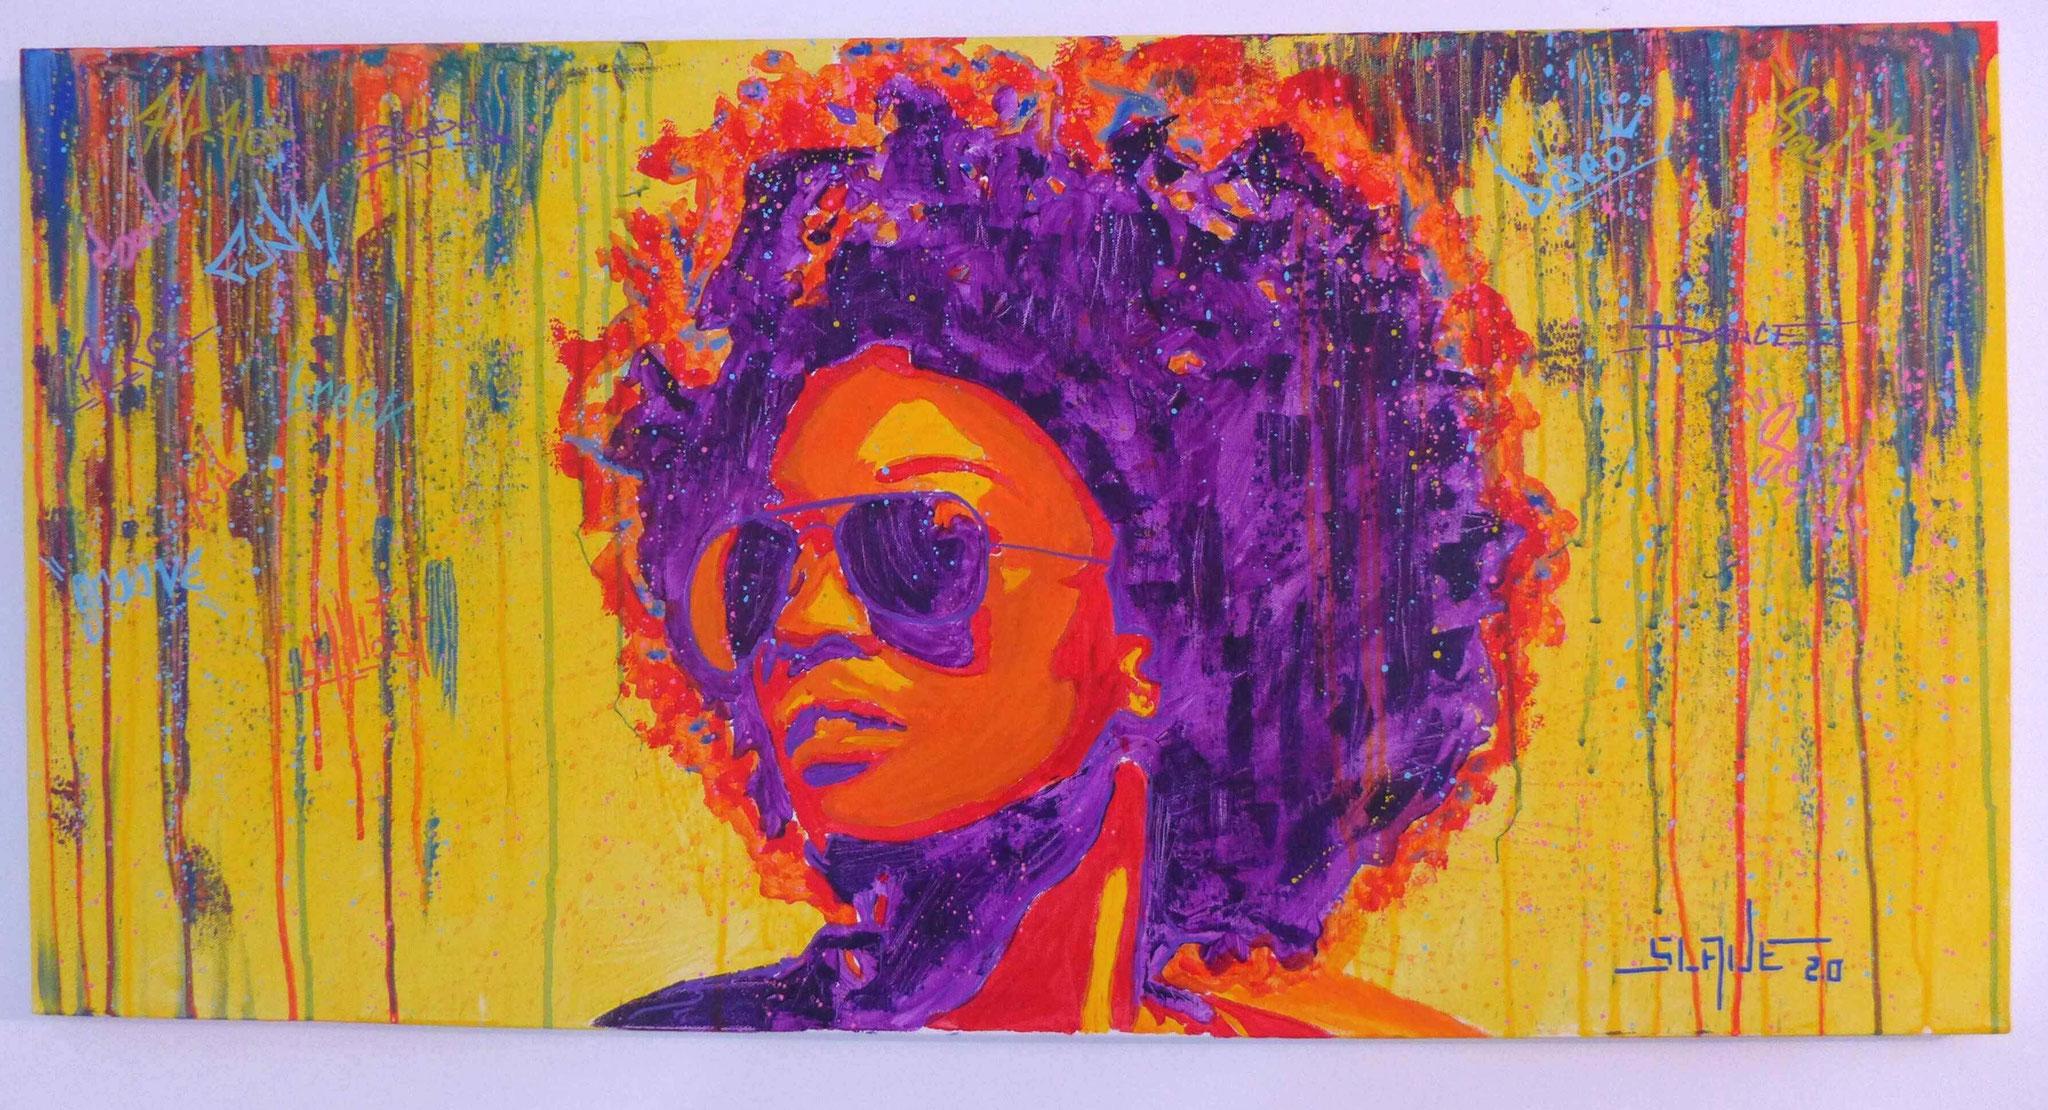 Achat tableau street art Funky Afro Woman - Slave 2.0